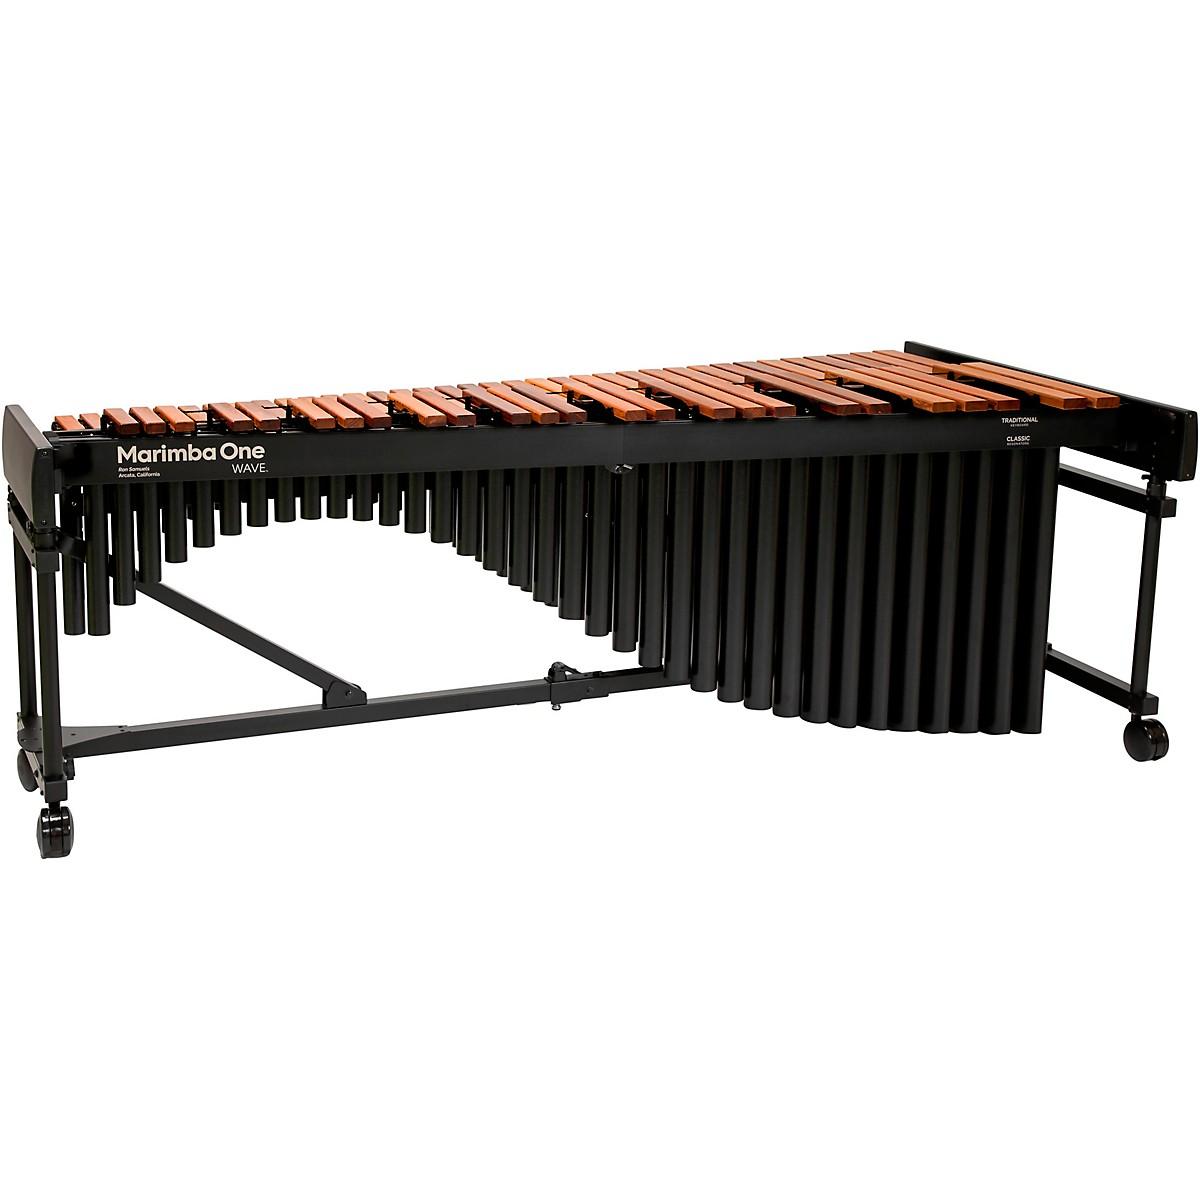 Marimba One Wave #9601 A442 5.0 Octave Marimba with Traditional Keyboard and Classic Resonators 4